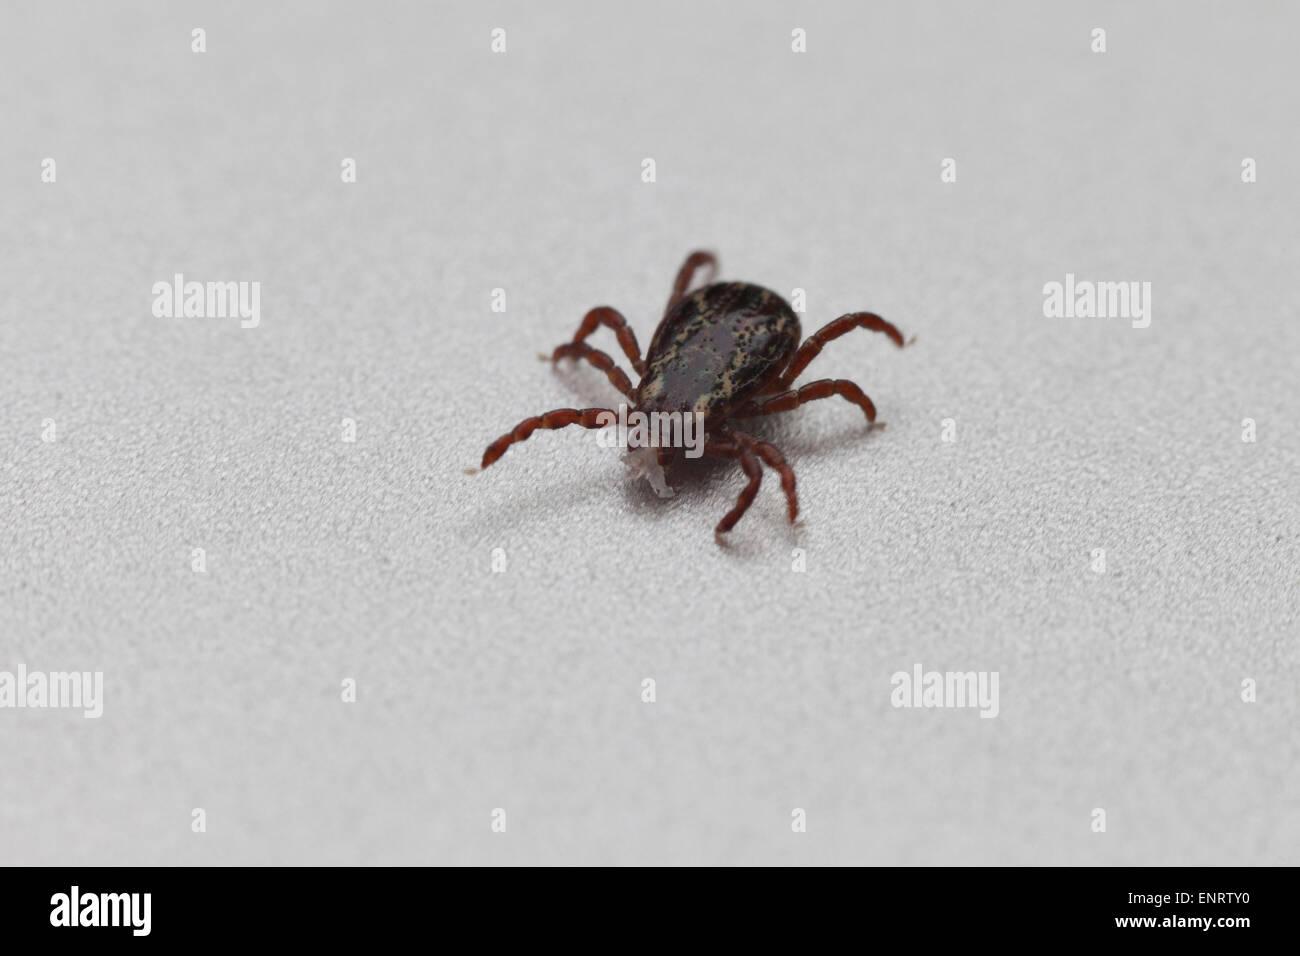 American dog tick (Dermacentor variabilis) - USA - Stock Image